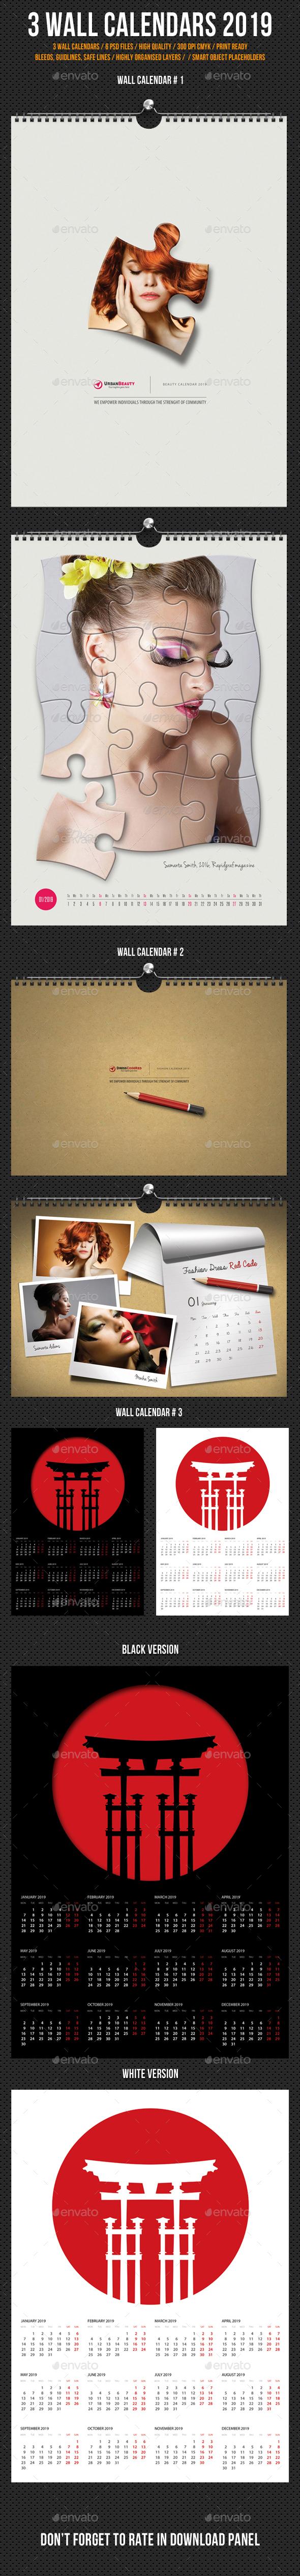 Wall Calendars 2019 Bundle V11 - Calendars Stationery